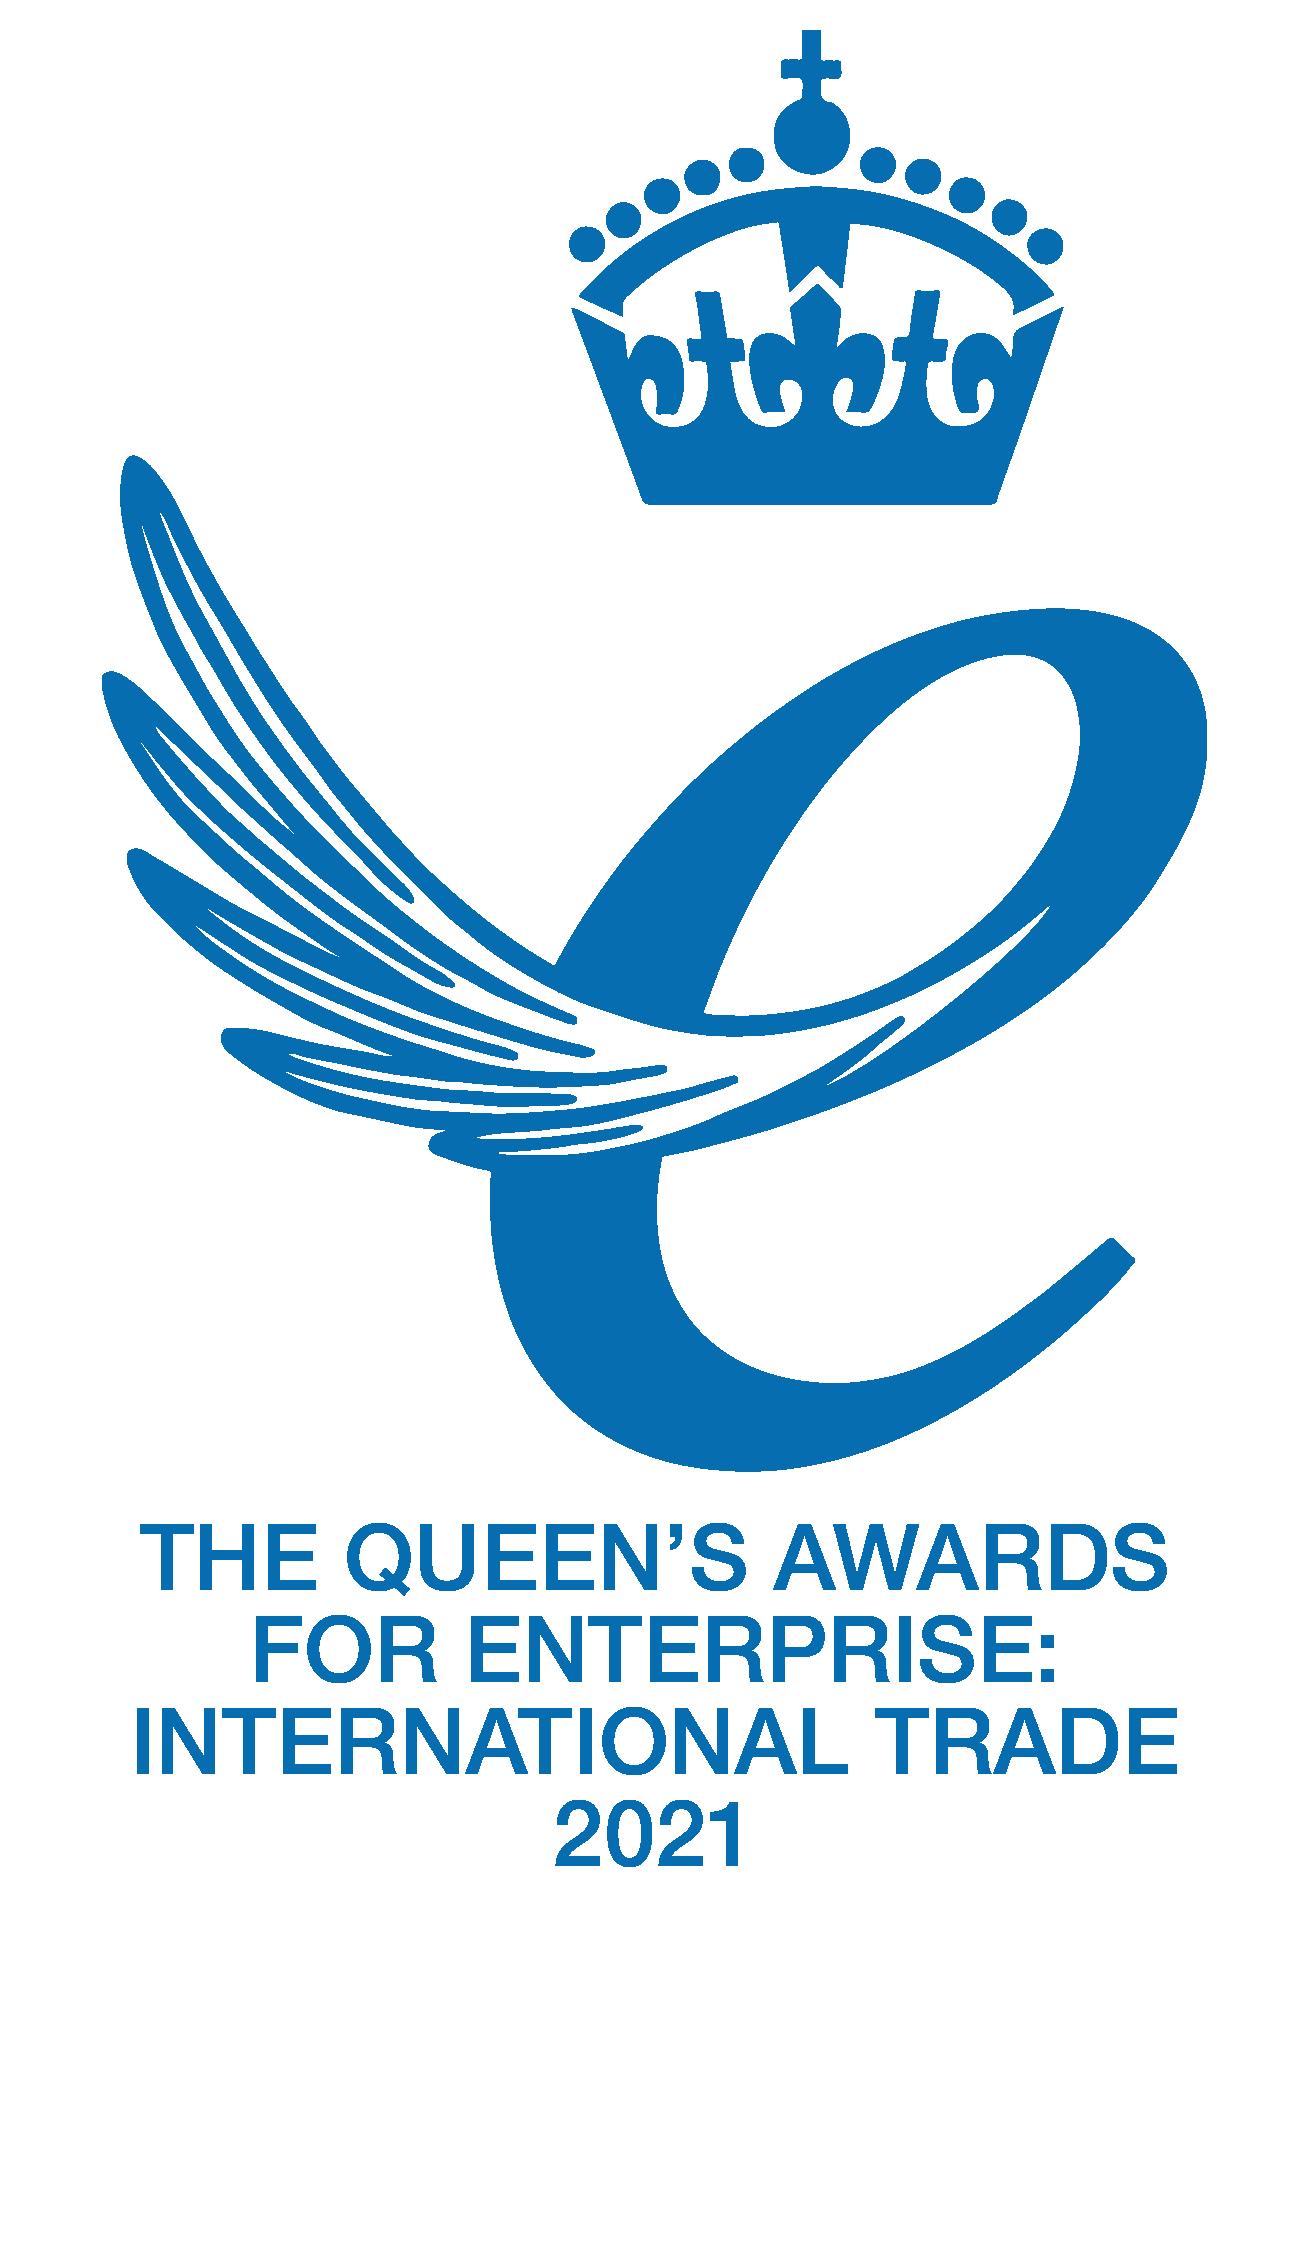 QA-logo-categories-2021_international trade_digital copy